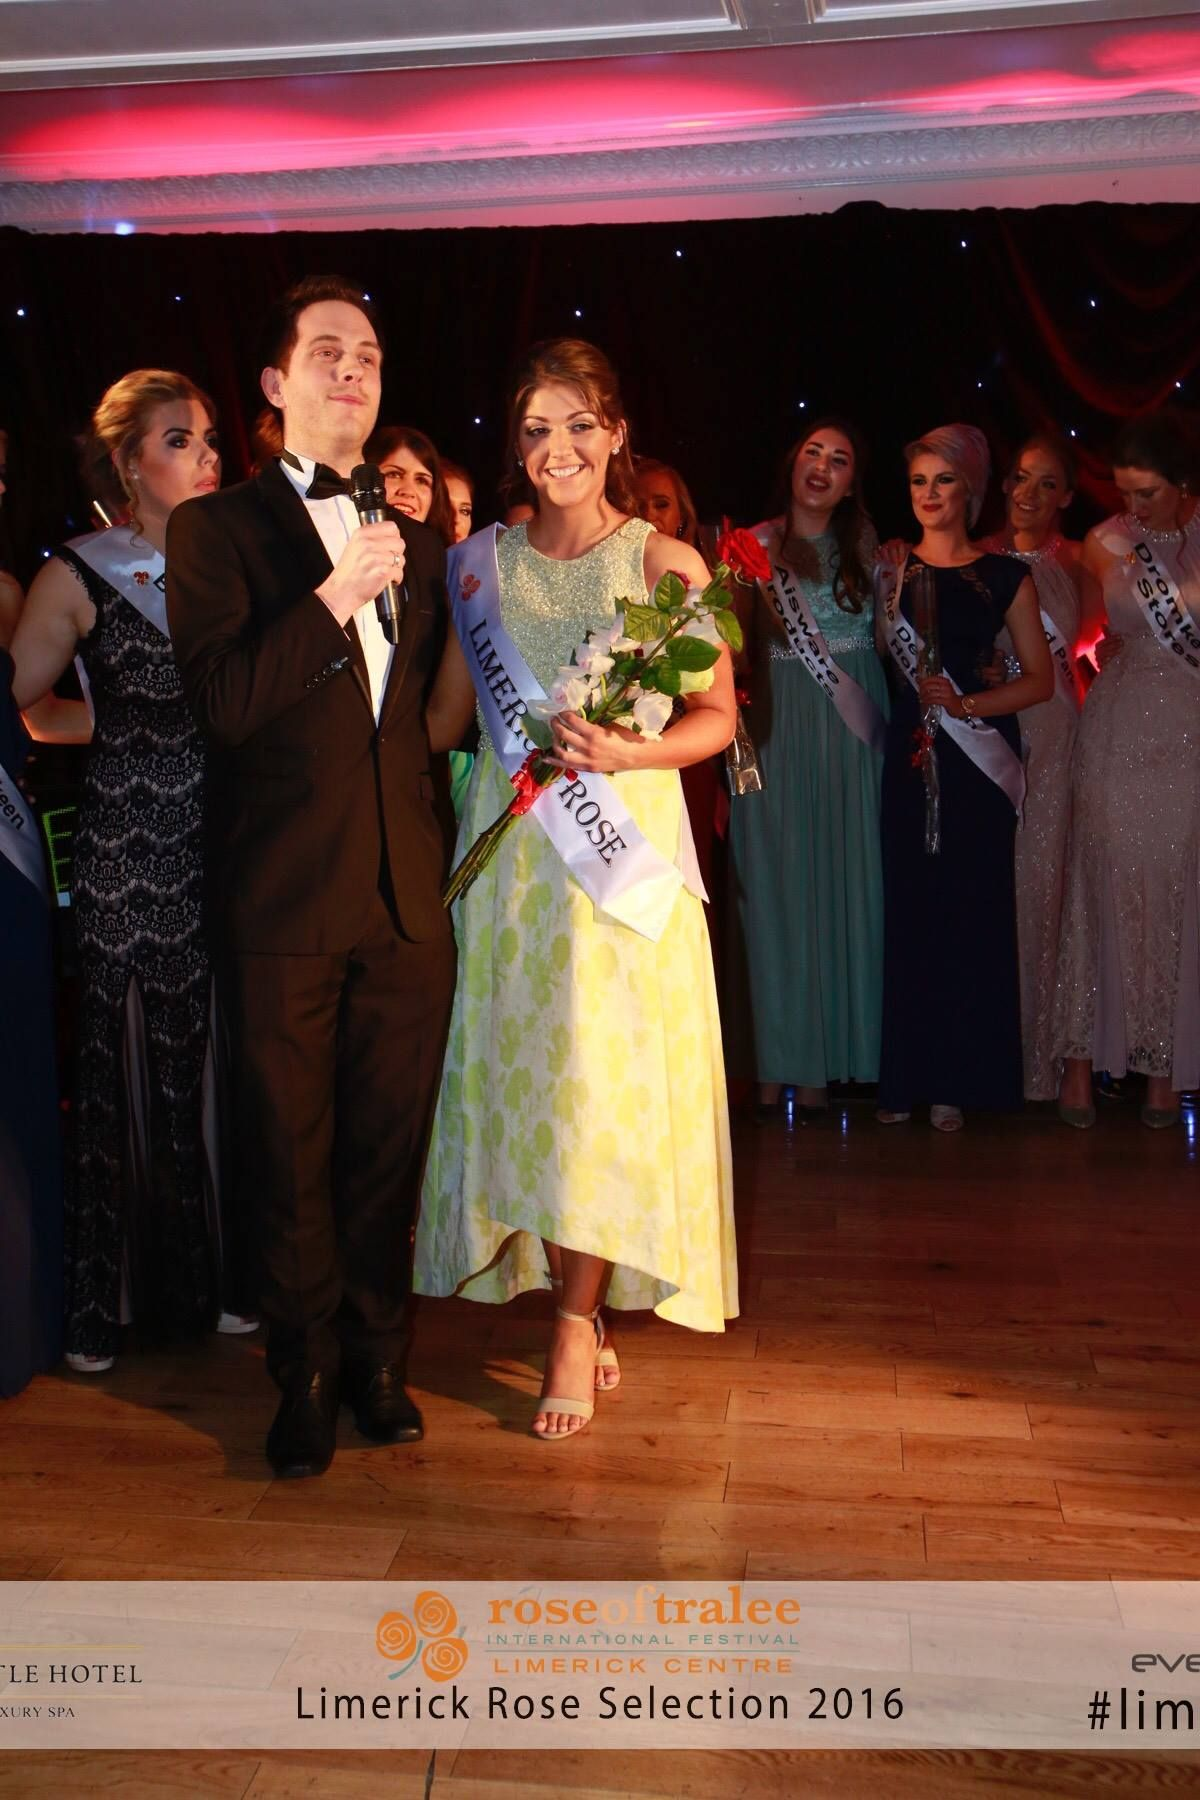 Limerick Rose 2016 - Marie Hennessy